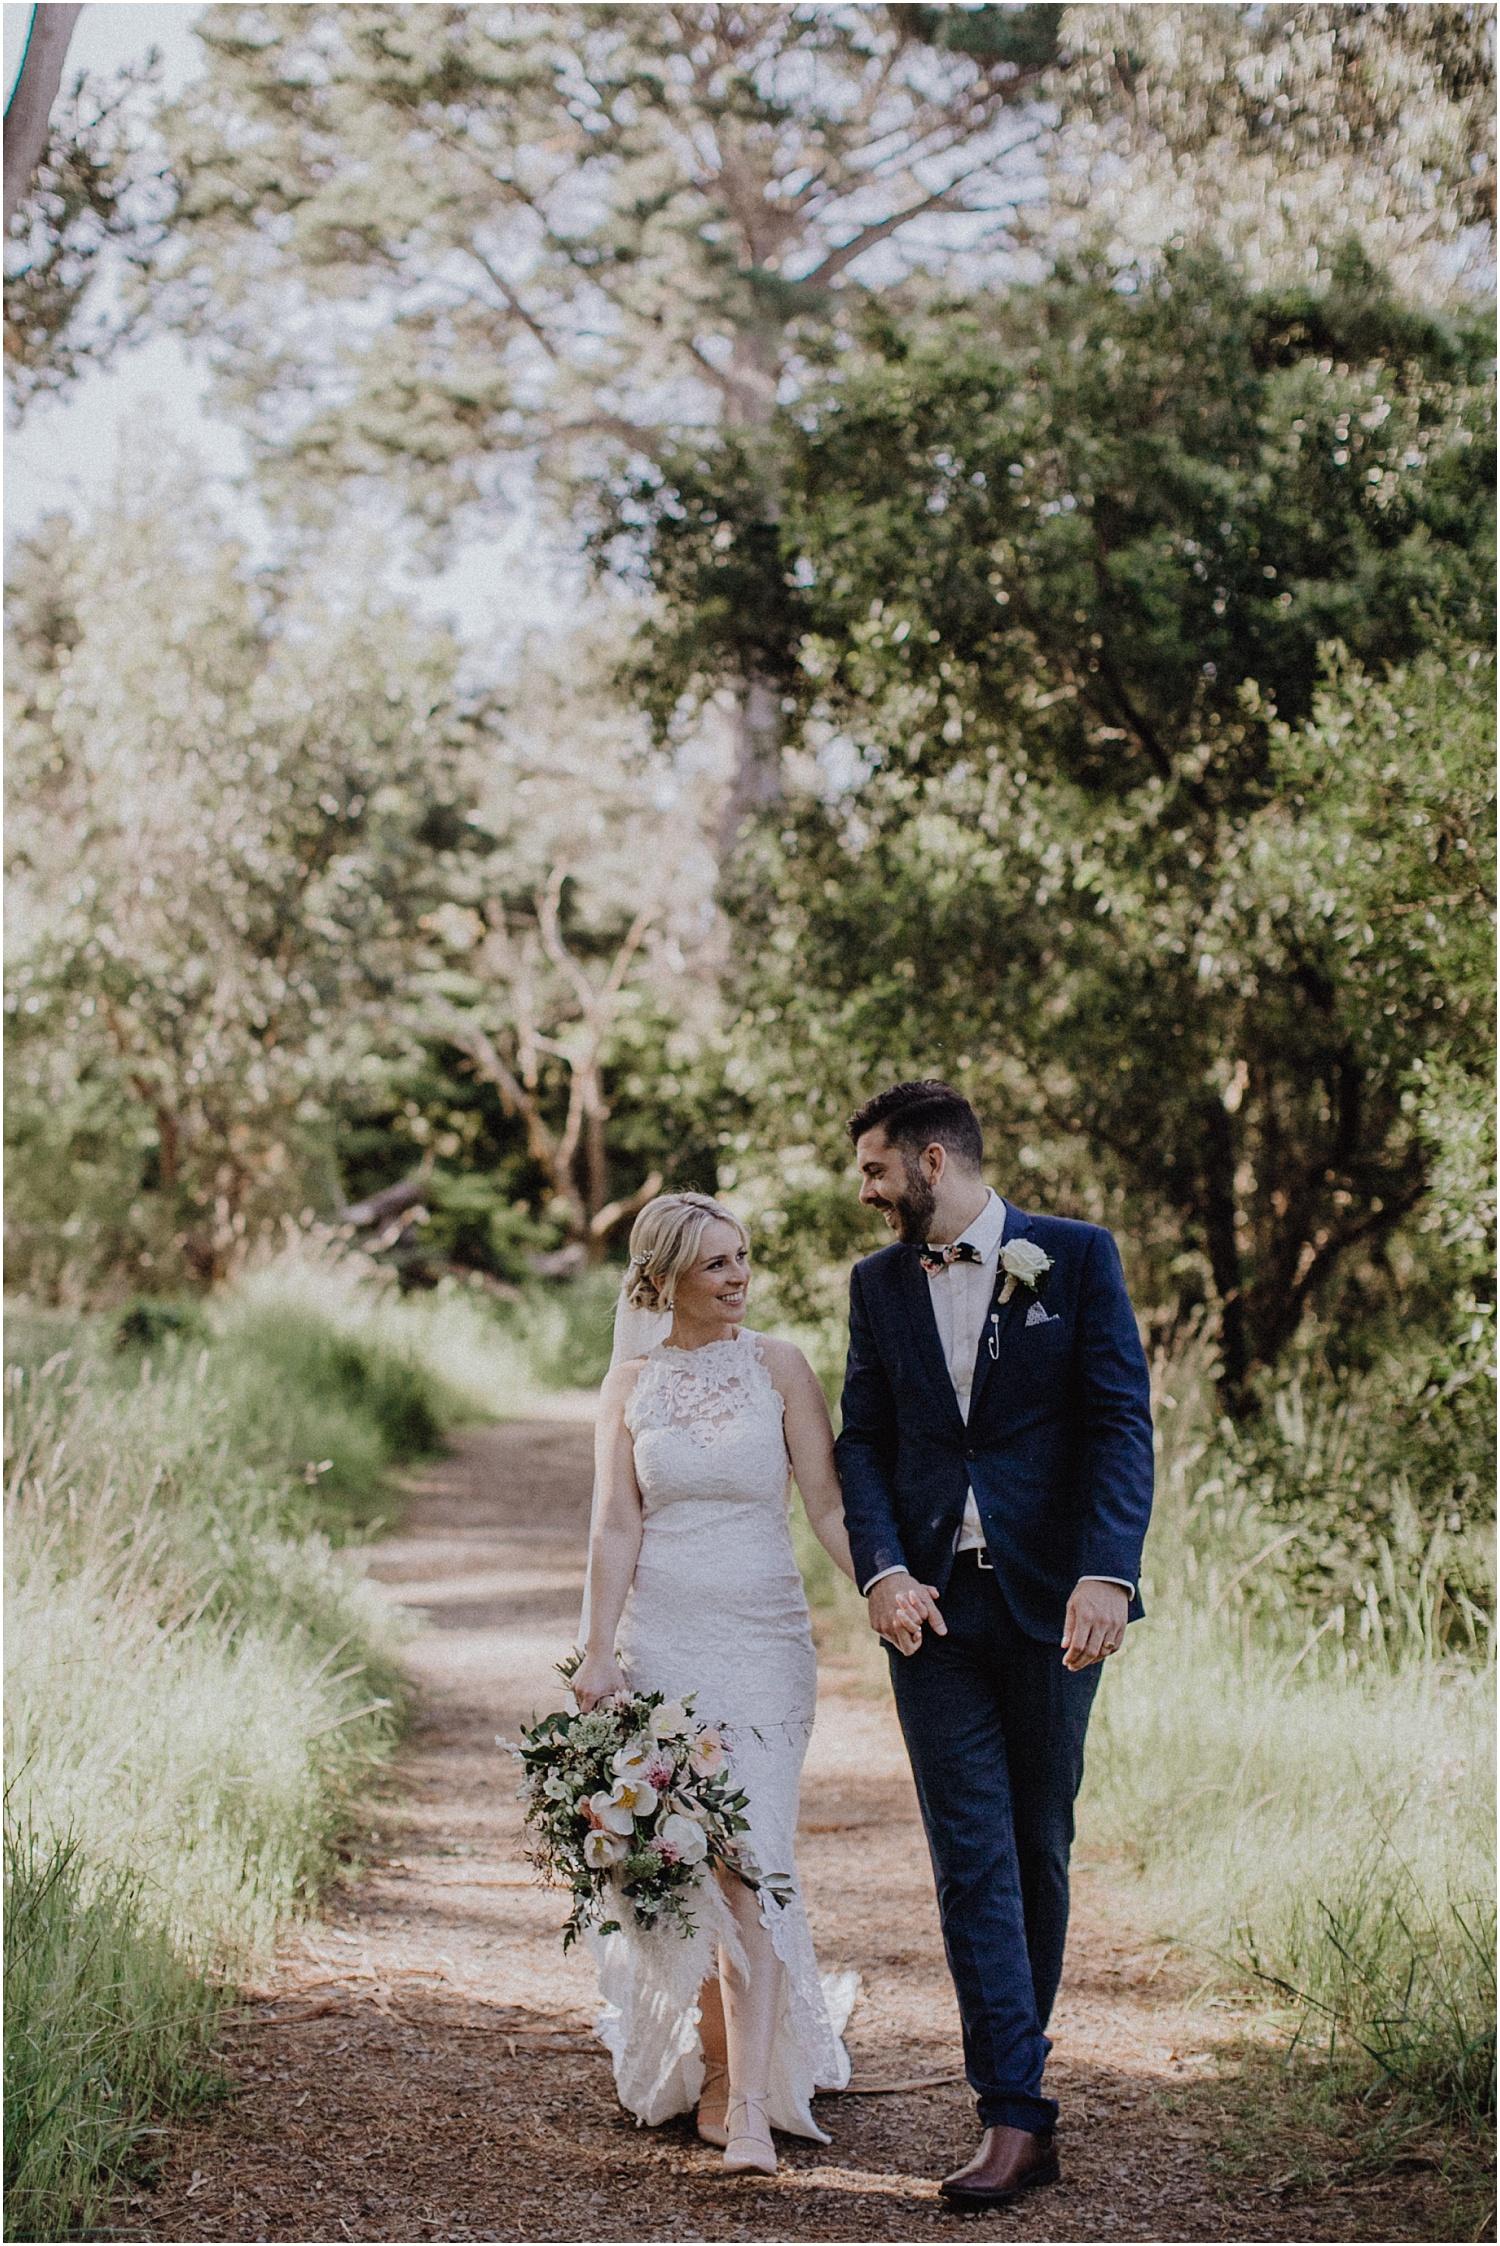 Nicolle and Damien's tipi wedding at the Flinders Yacht Club on the Mornington Peninsula._0109.jpg